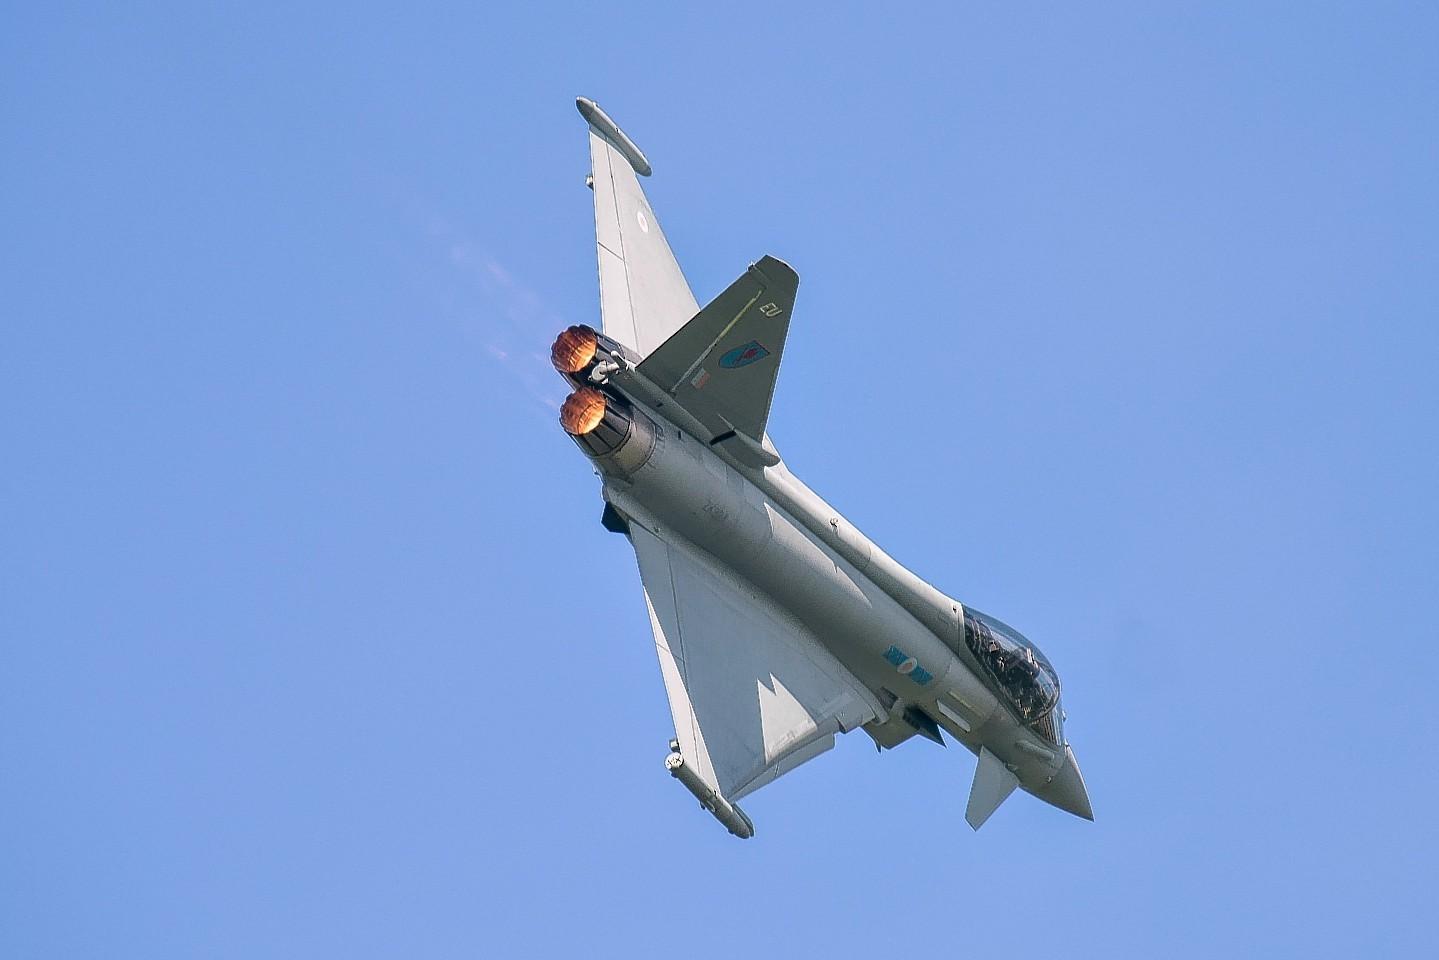 RAF Typhoon from RAF Lossiemouth